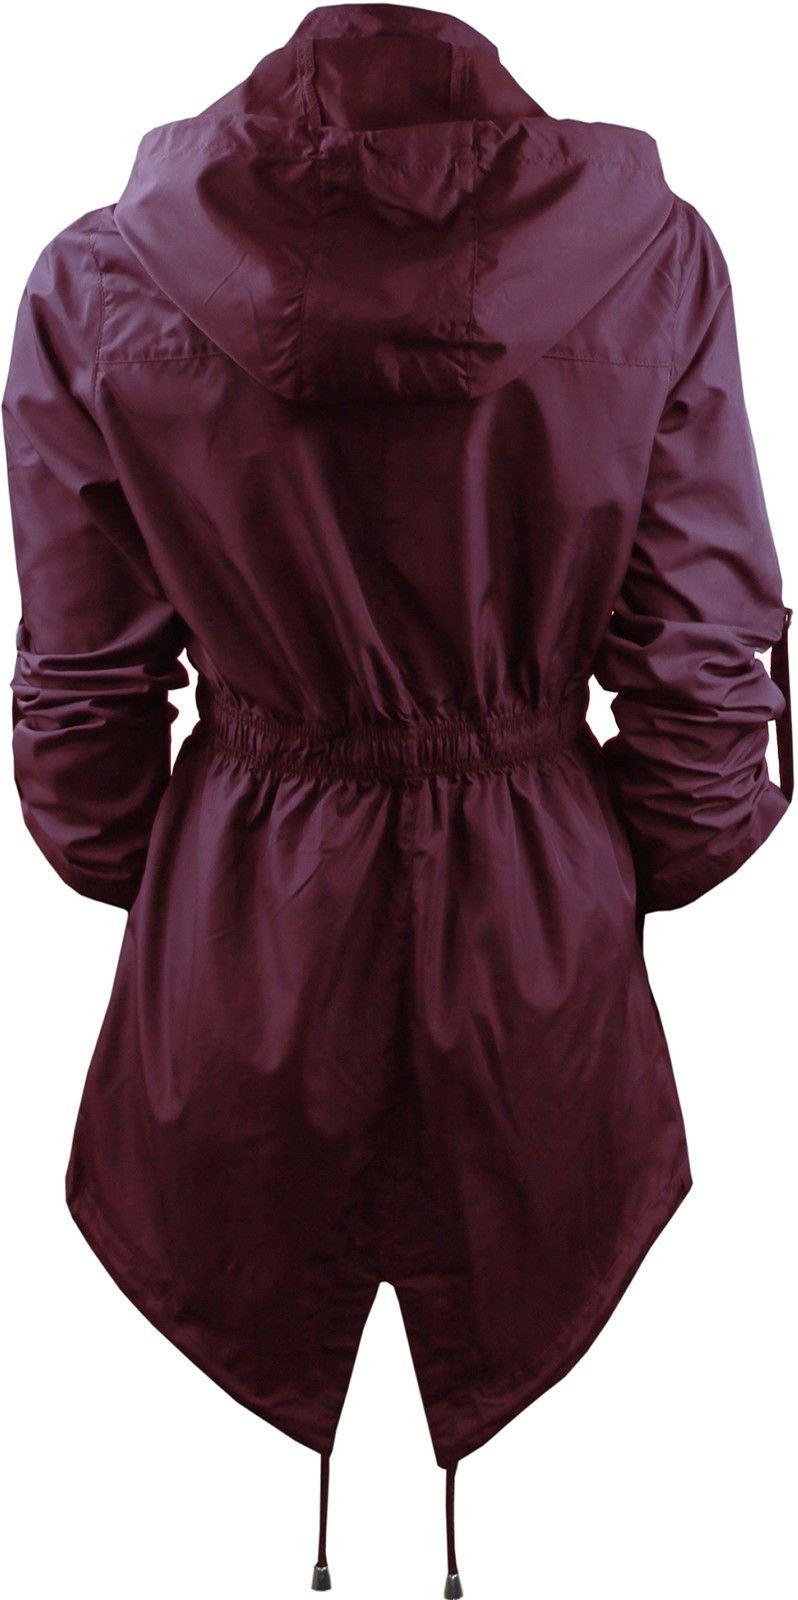 Para-Mujer-Damas-Alma-valiente-showerproof-Plain-parka-con-capucha-lluvia-con-cremallera-chaqueta miniatura 6